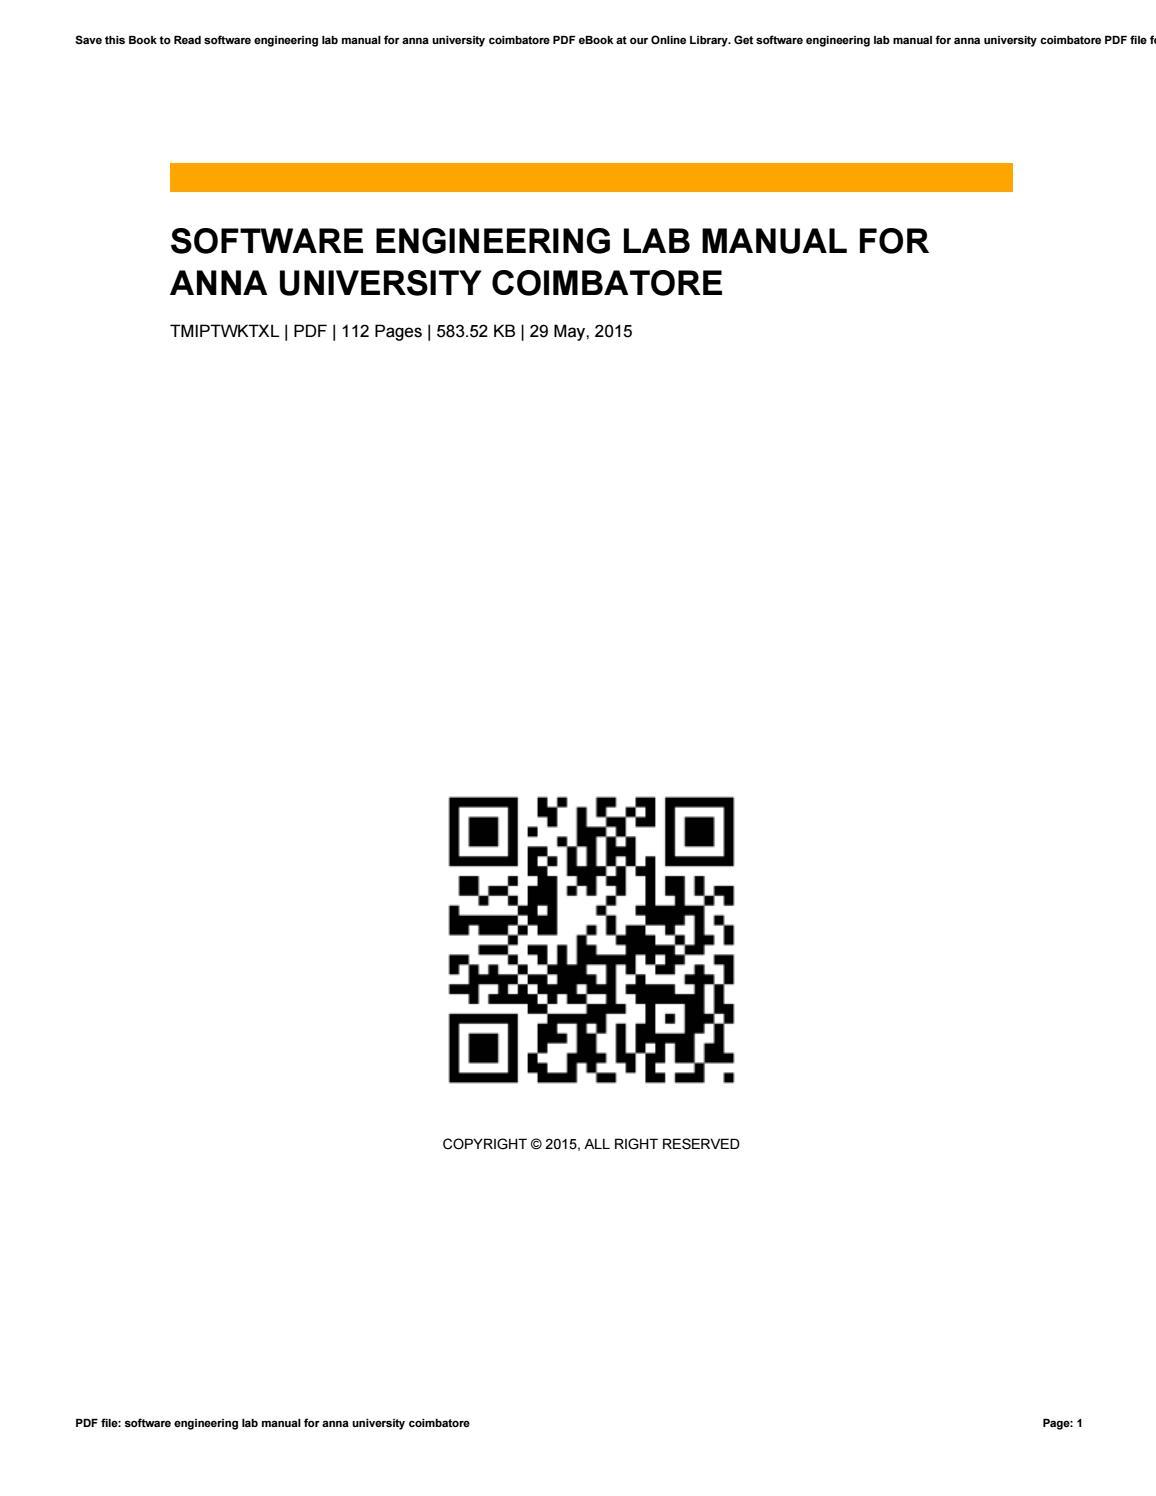 software engineering lab manual for anna university coimbatore by rh issuu com anna university environmental engineering lab manual anna university engineering practices lab manual pdf